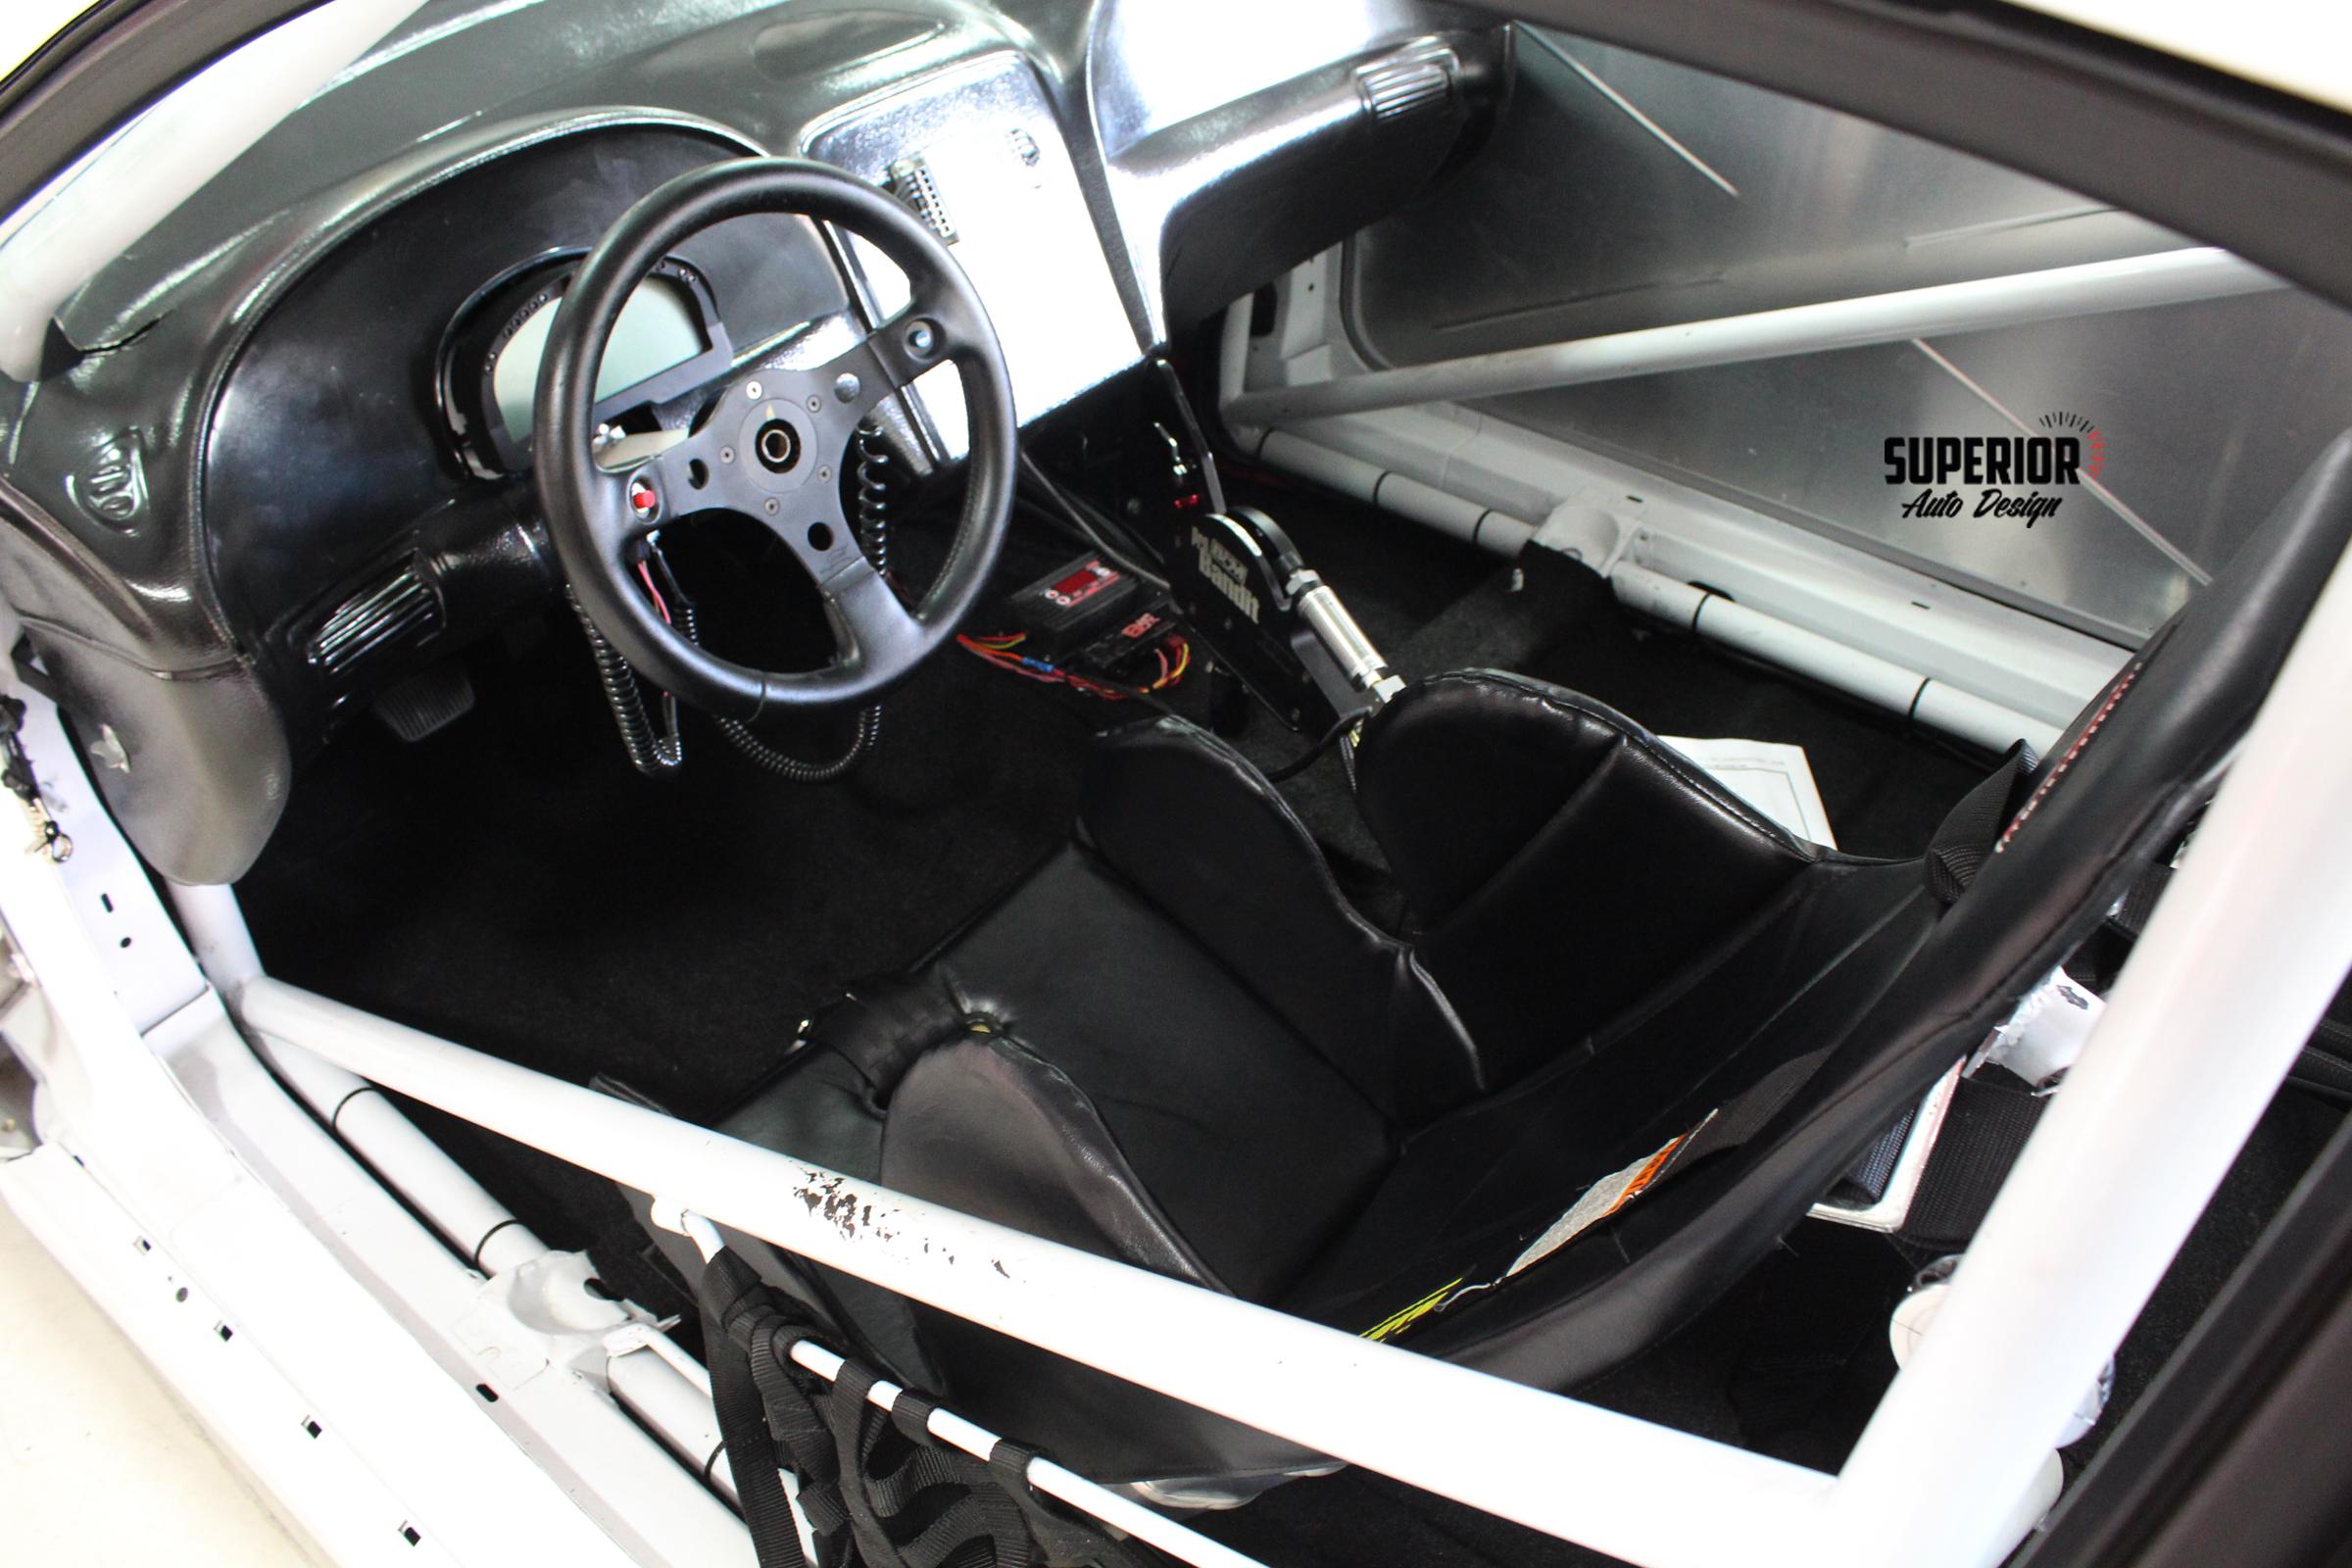 MUSTANG RACE CAR TWIN TURBO CARPET SUPERIOR AUTO DESIGN 10